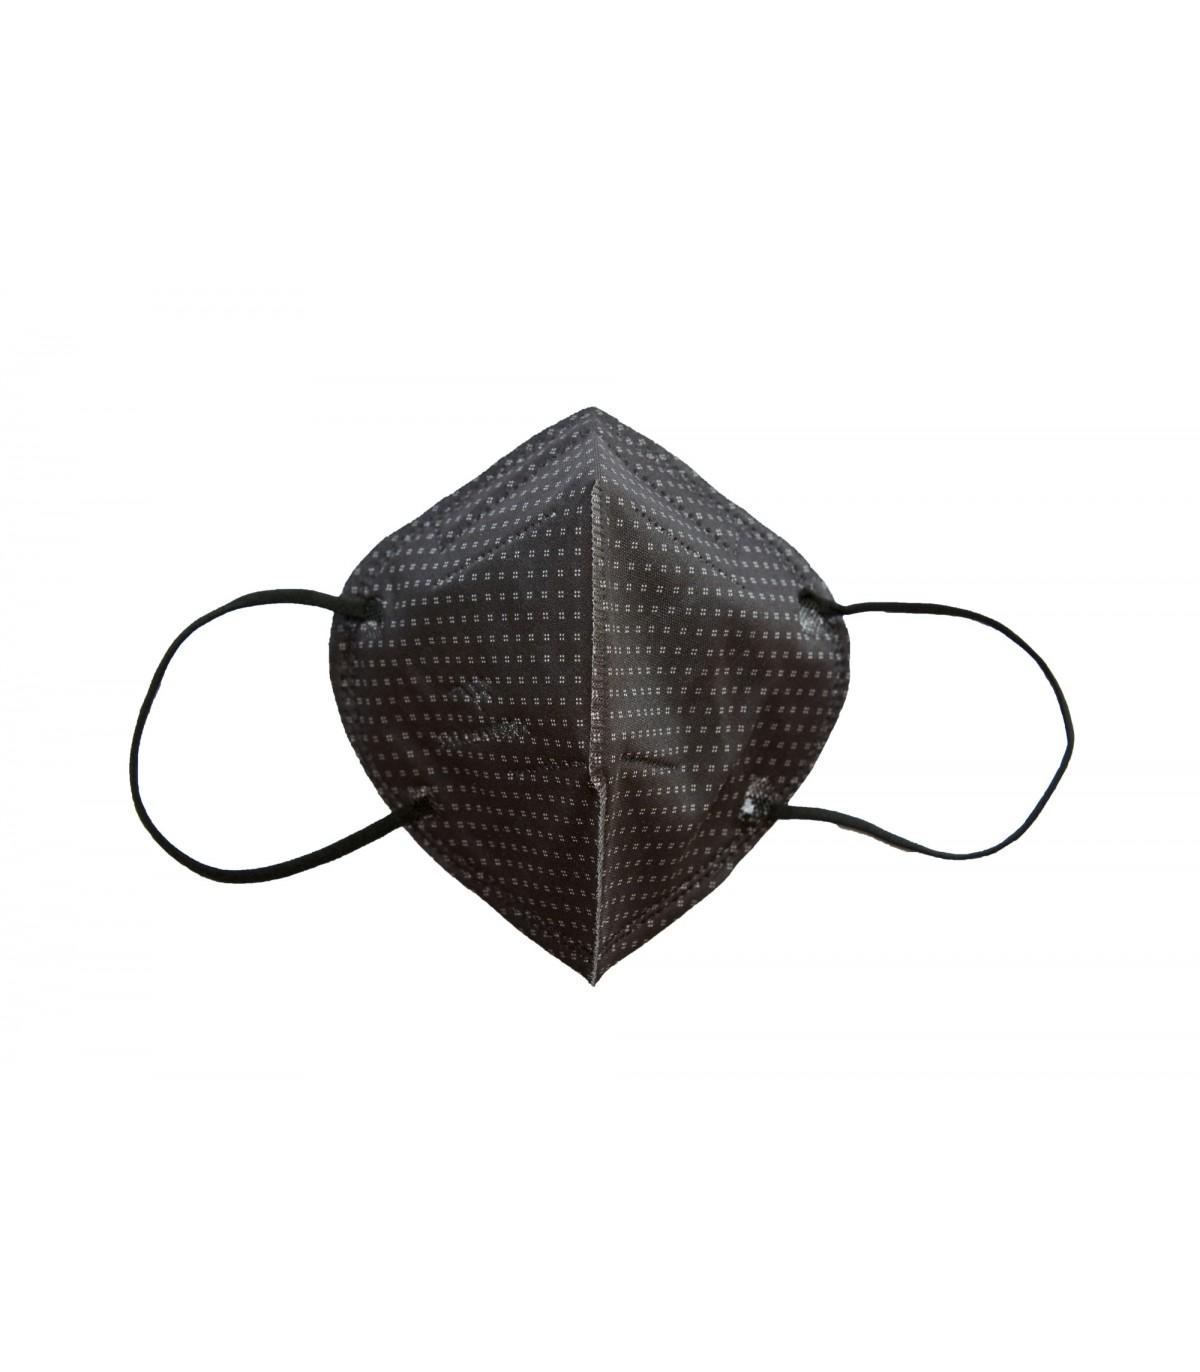 FFP2 face mask - MFNR100